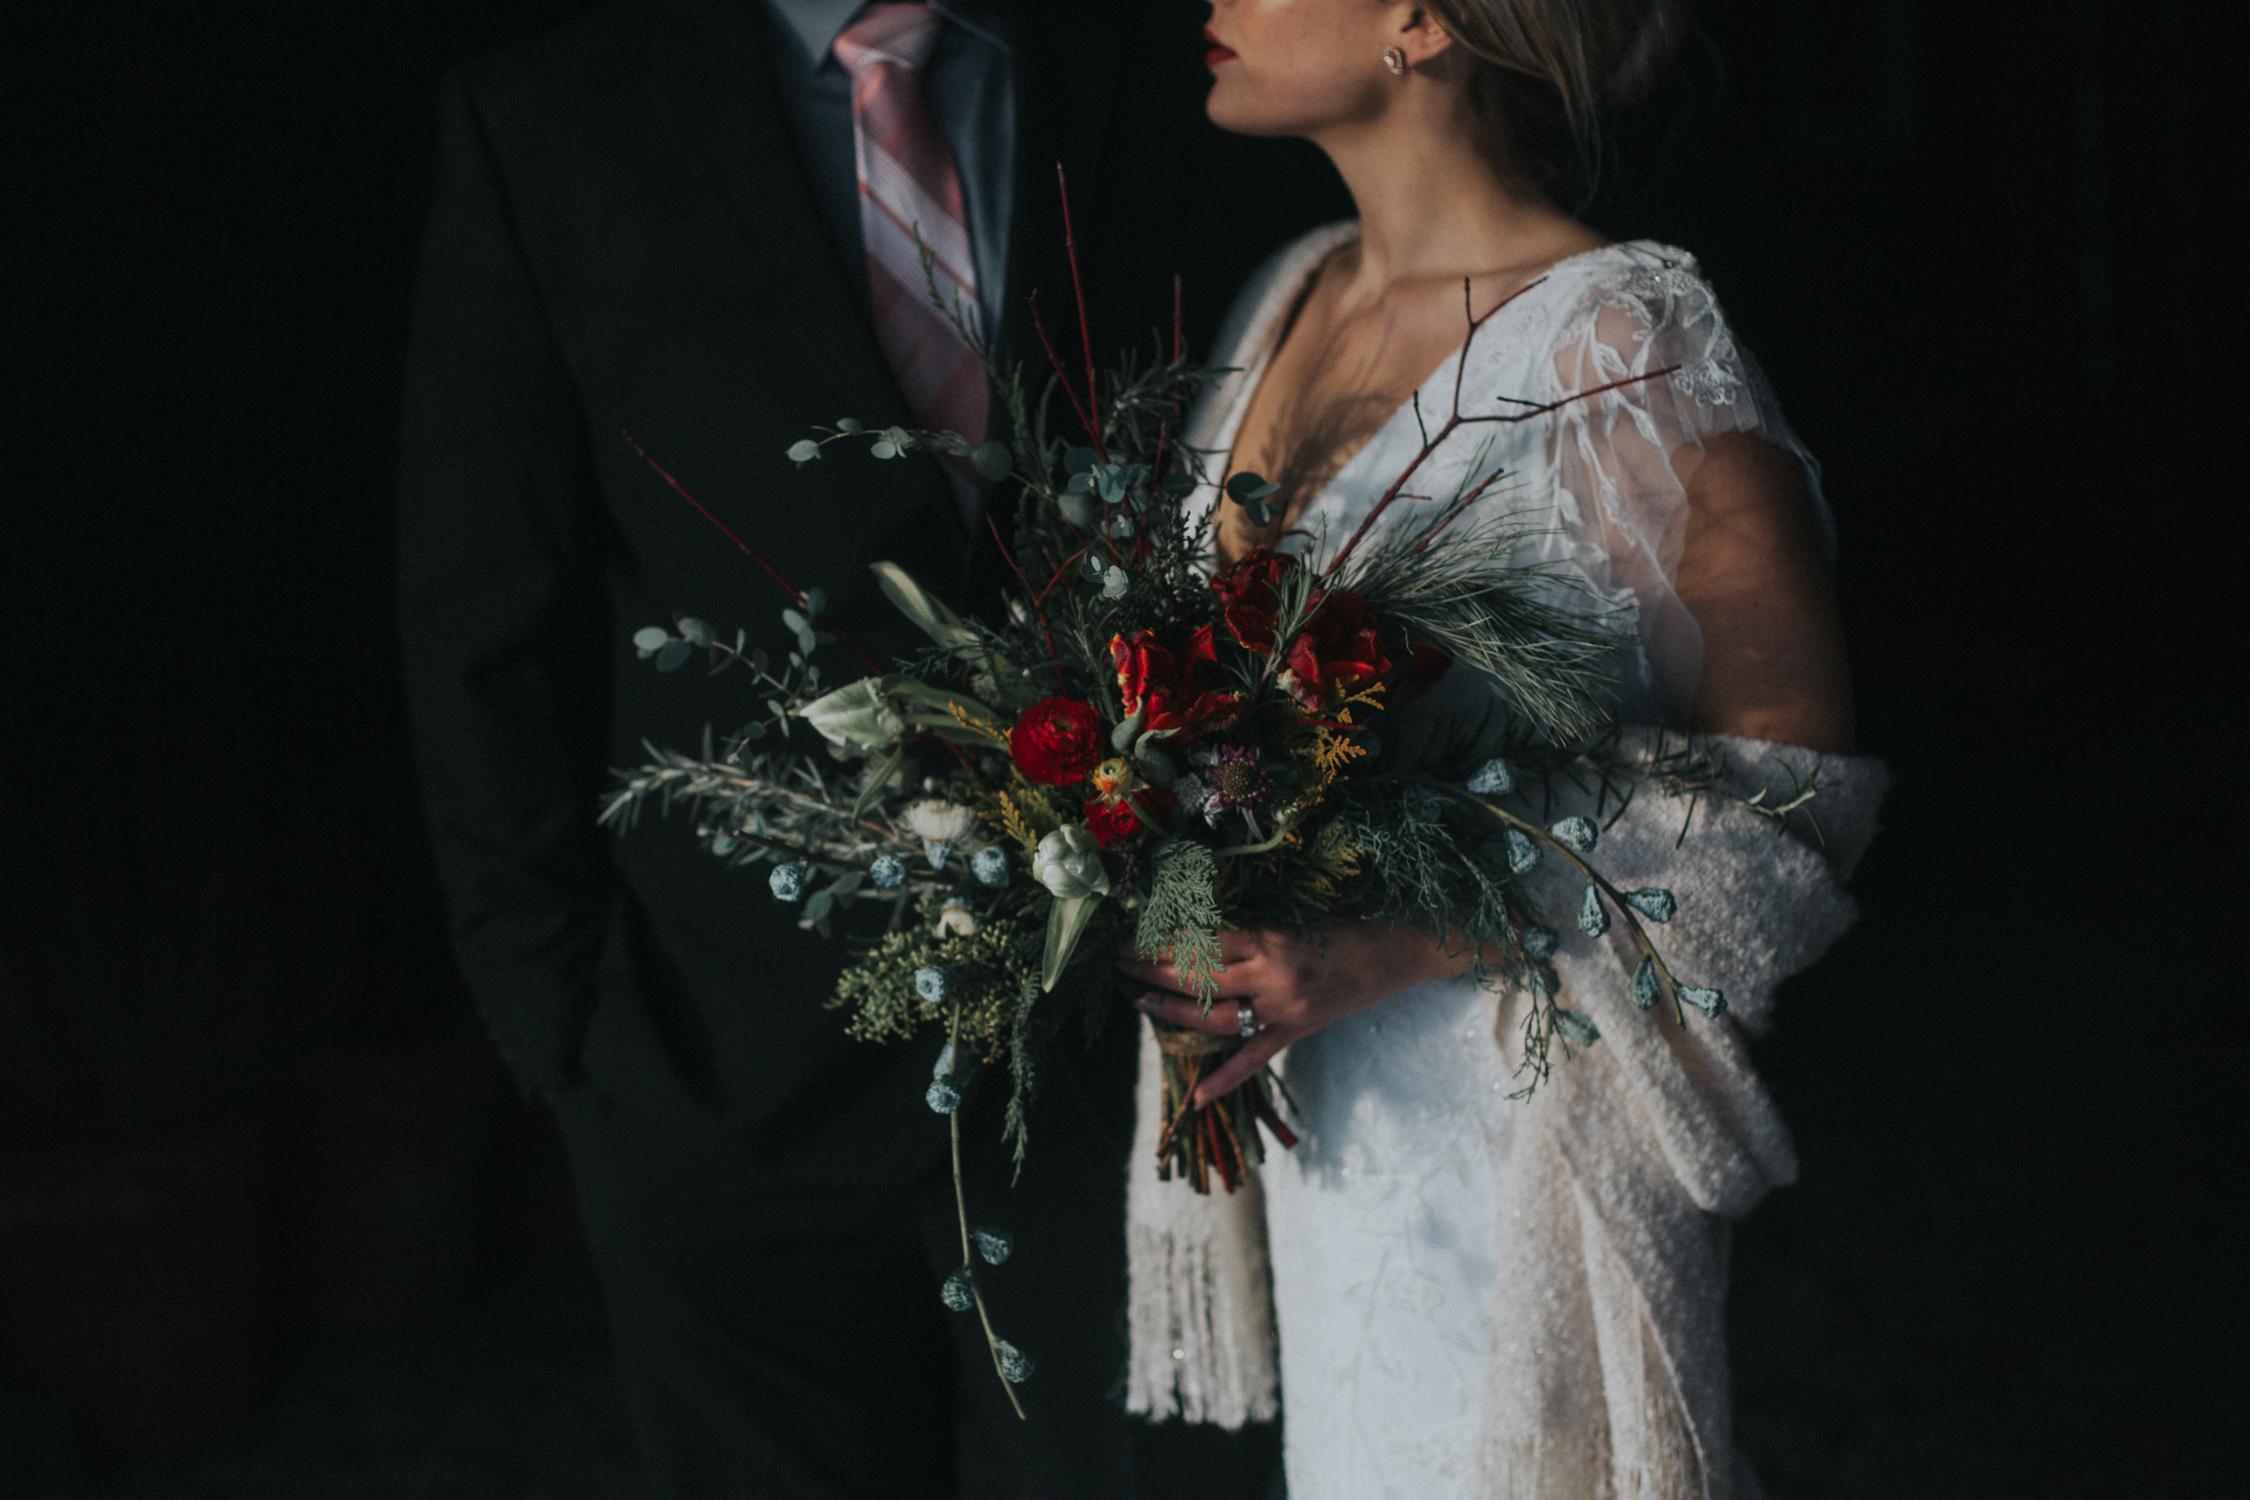 mnd_farm_winter_wedding_016.jpg